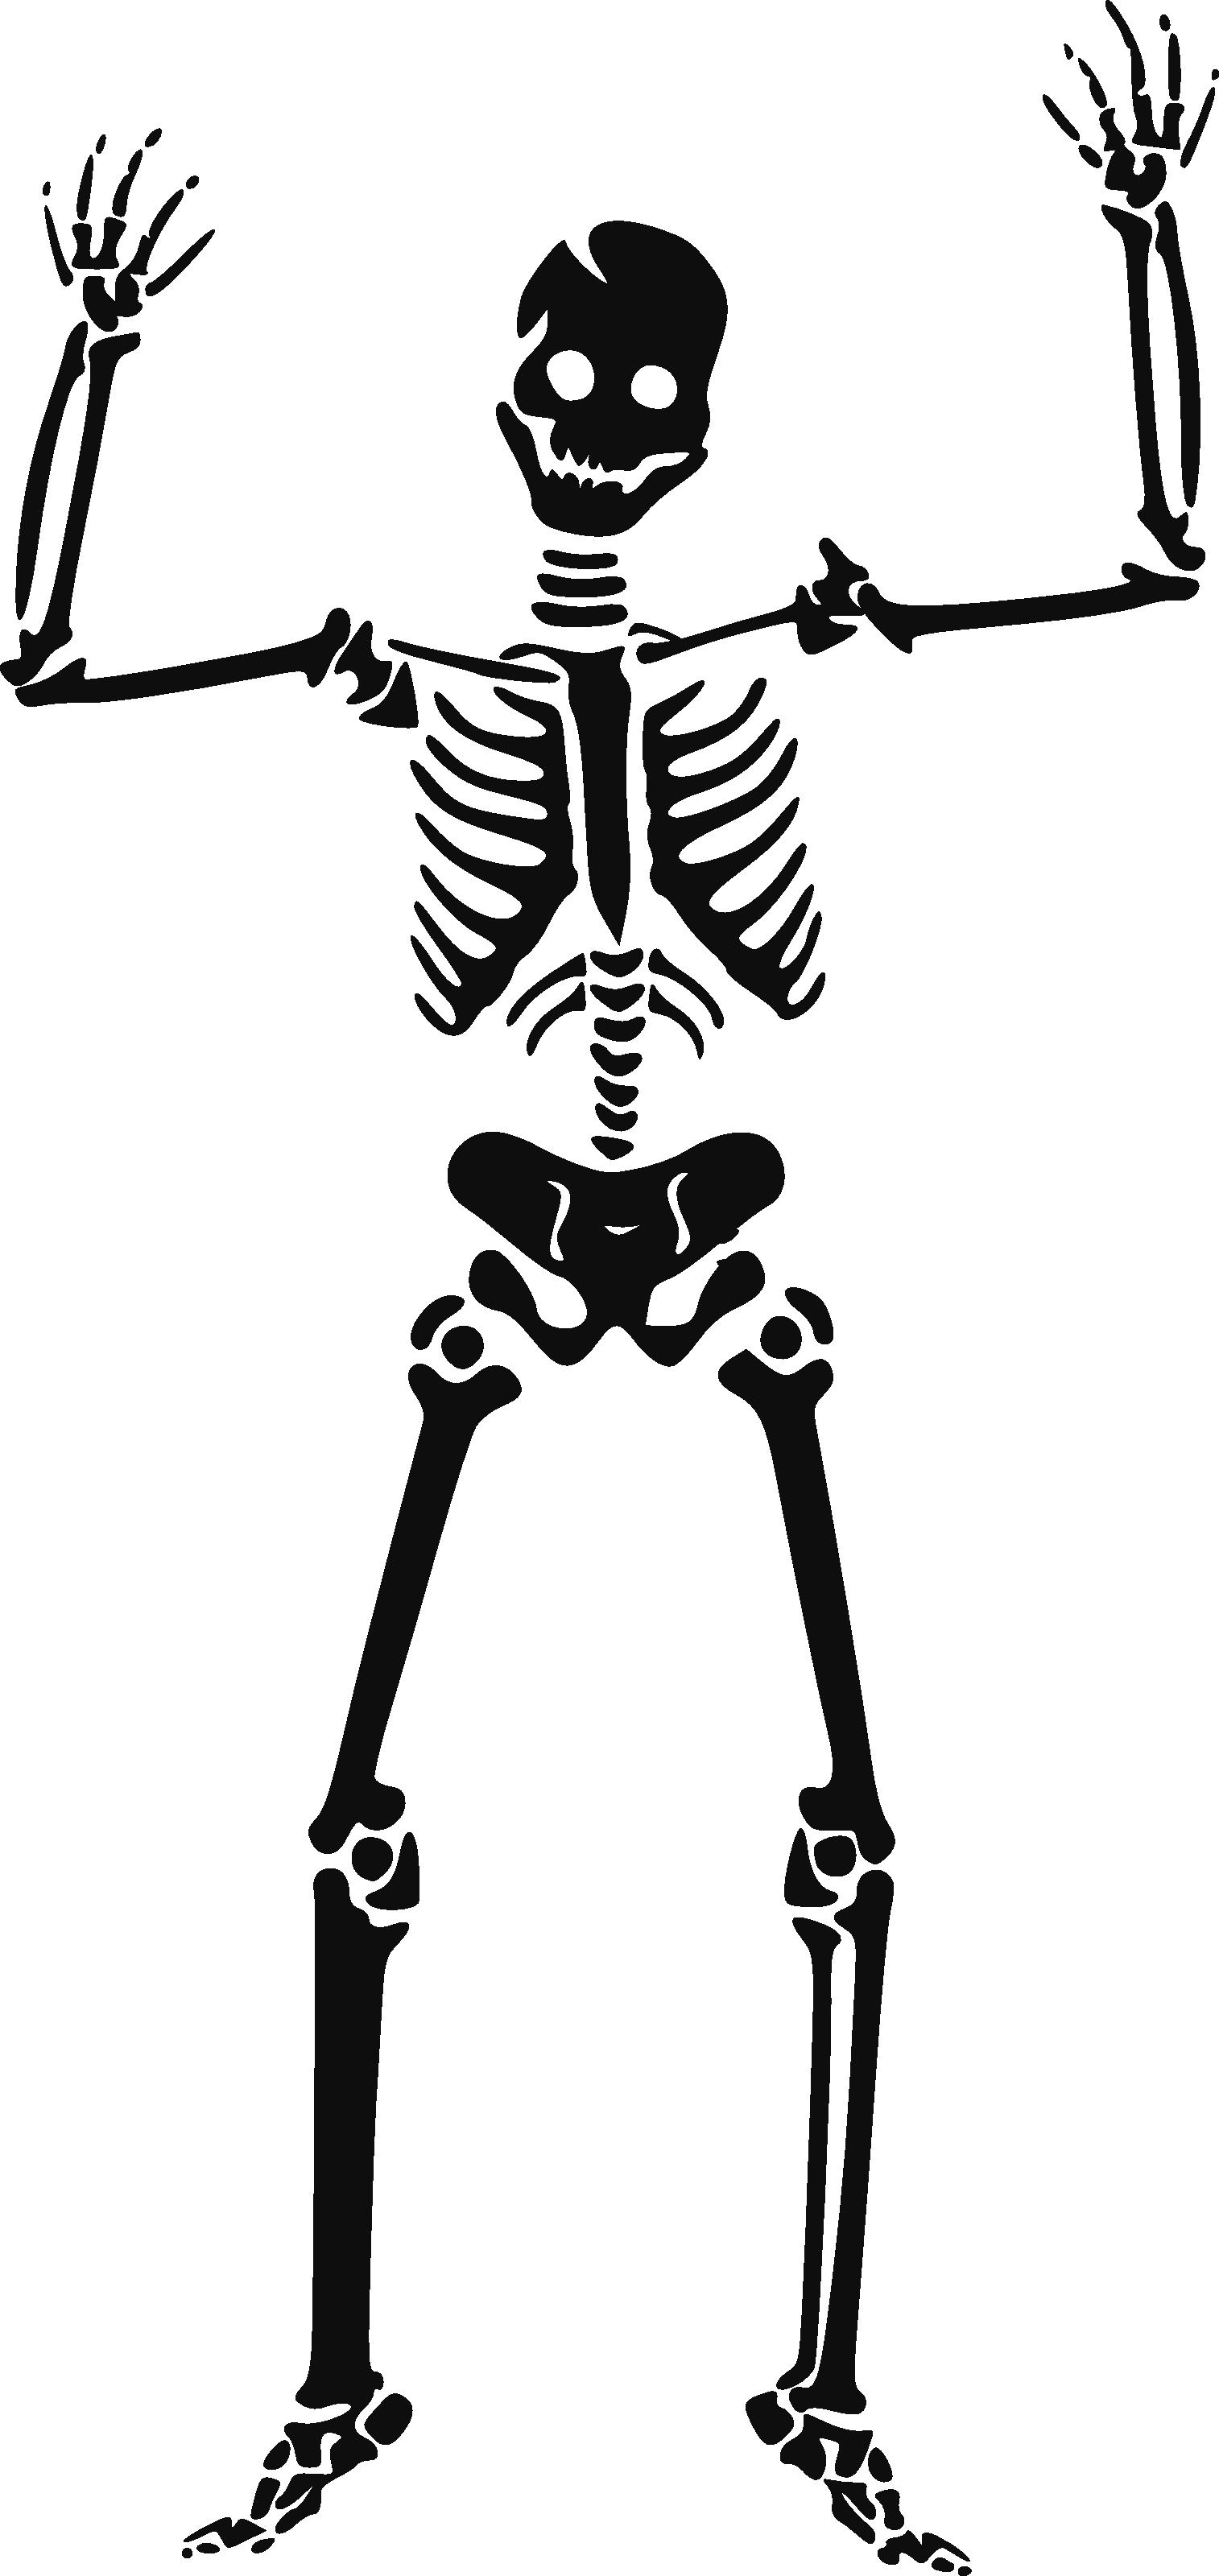 public domain famine clipart Google Search Halloween